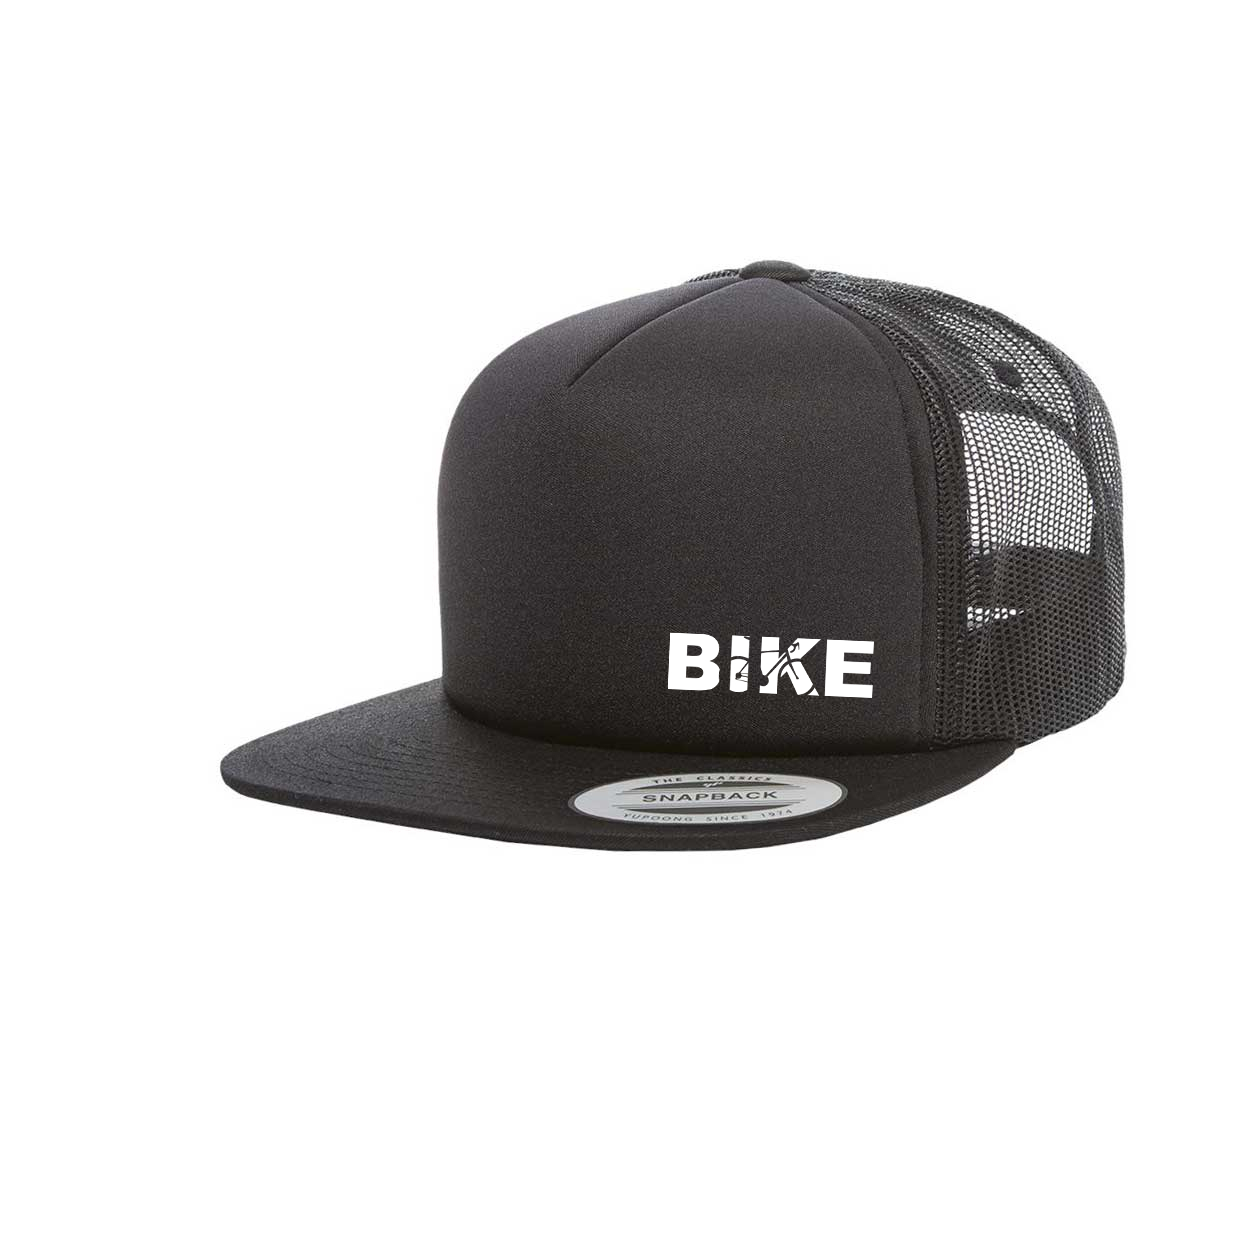 Bike Cycling Logo Night Out Premium Foam Flat Brim Snapback Hat Black (White Logo)